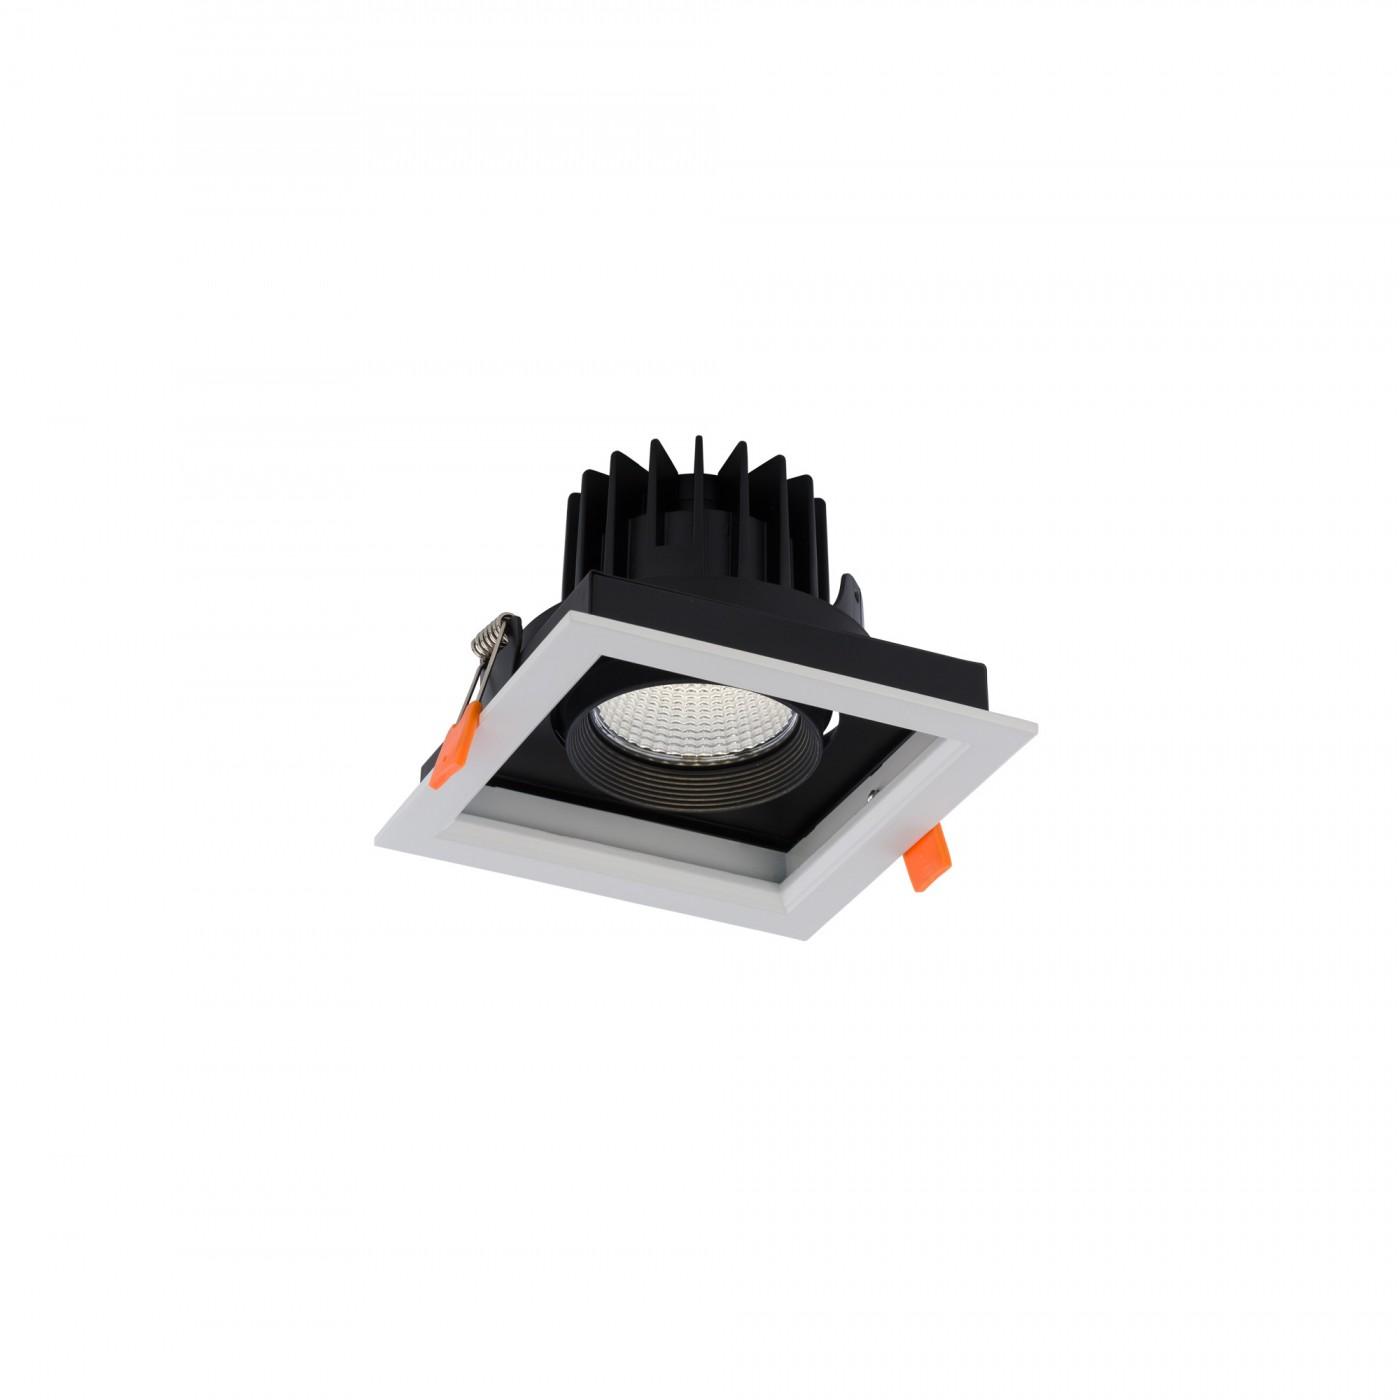 CL DIA LED 18W 3000K white-black 8722 Nowodvorski Lighting